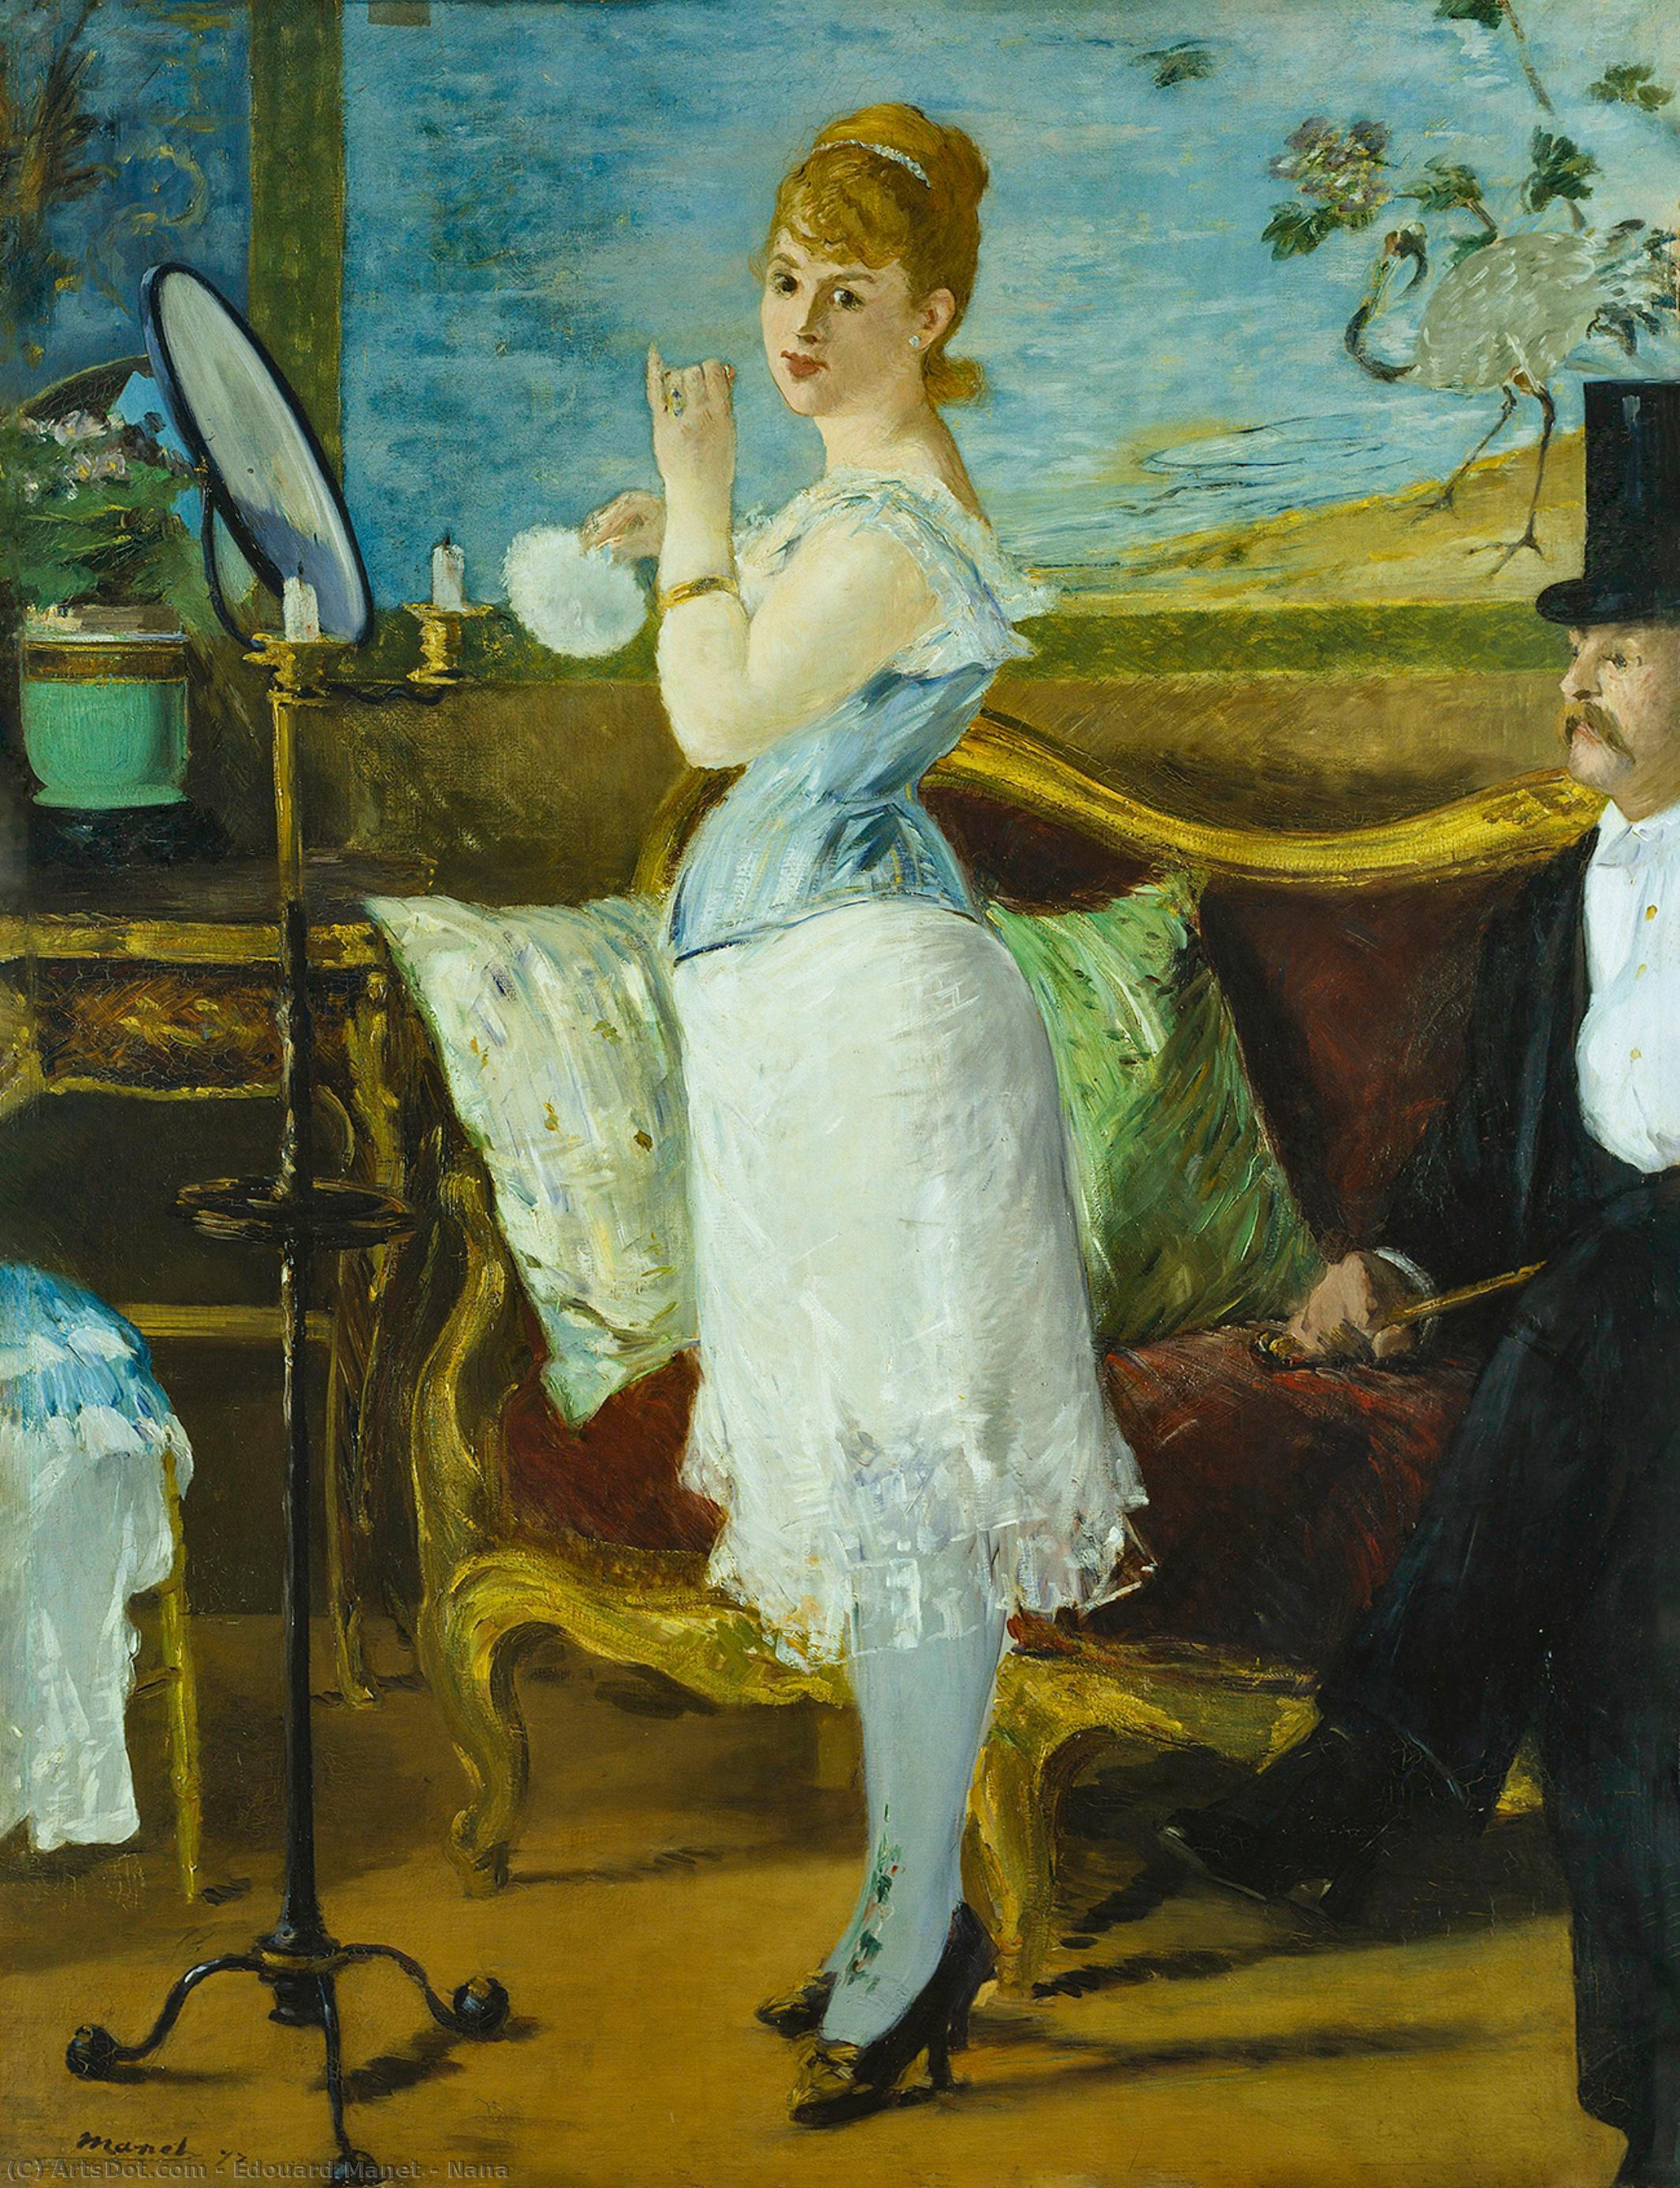 Wikioo.org - The Encyclopedia of Fine Arts - Painting, Artwork by Edouard Manet - Nana